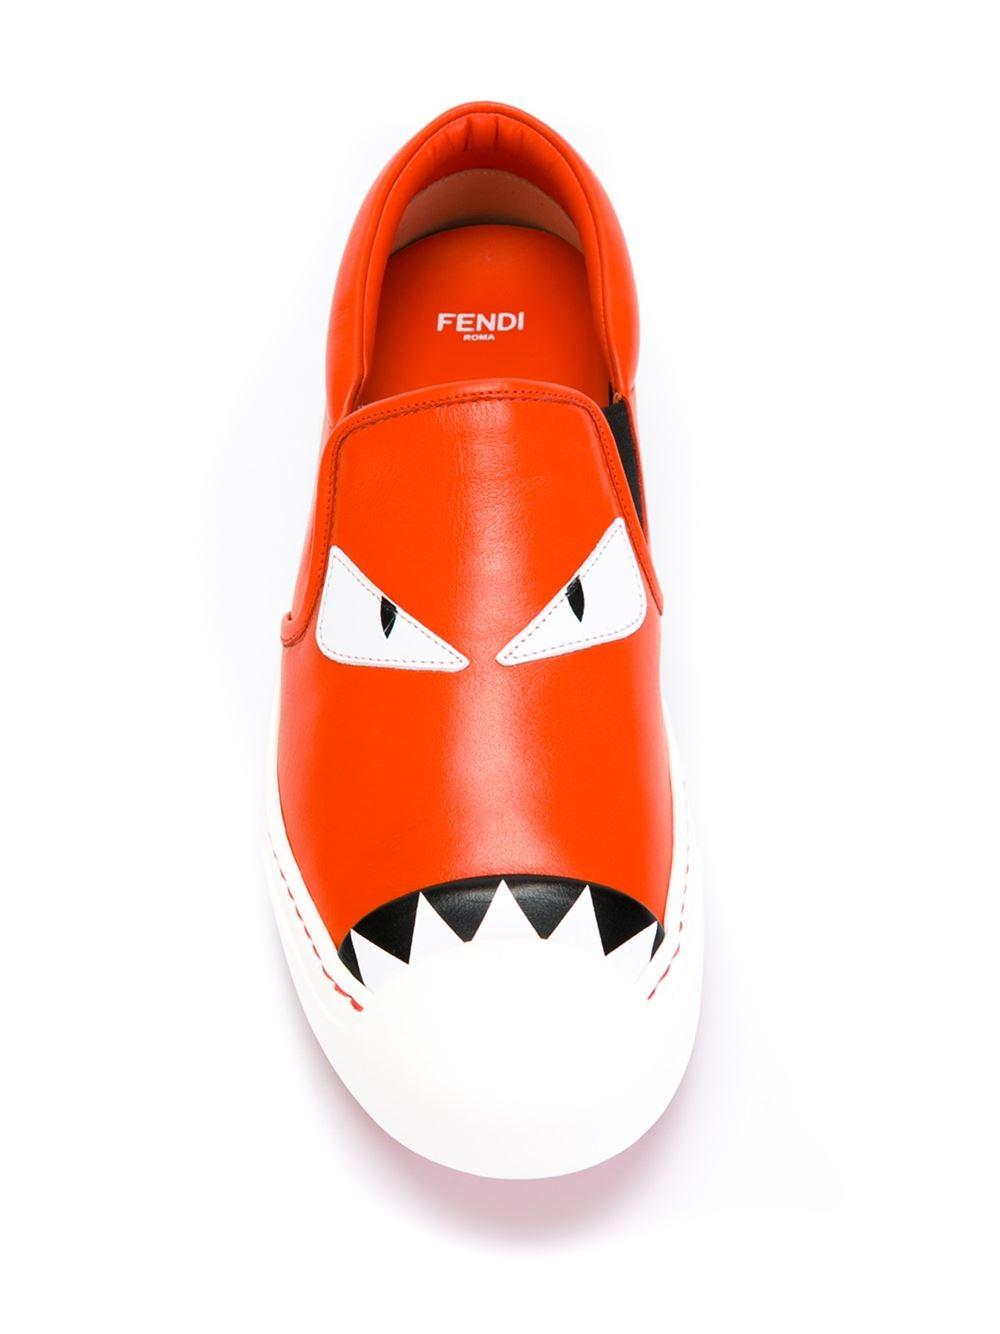 Blue and Red Bag Bugs Sneakers Fendi VT9gCRT2v